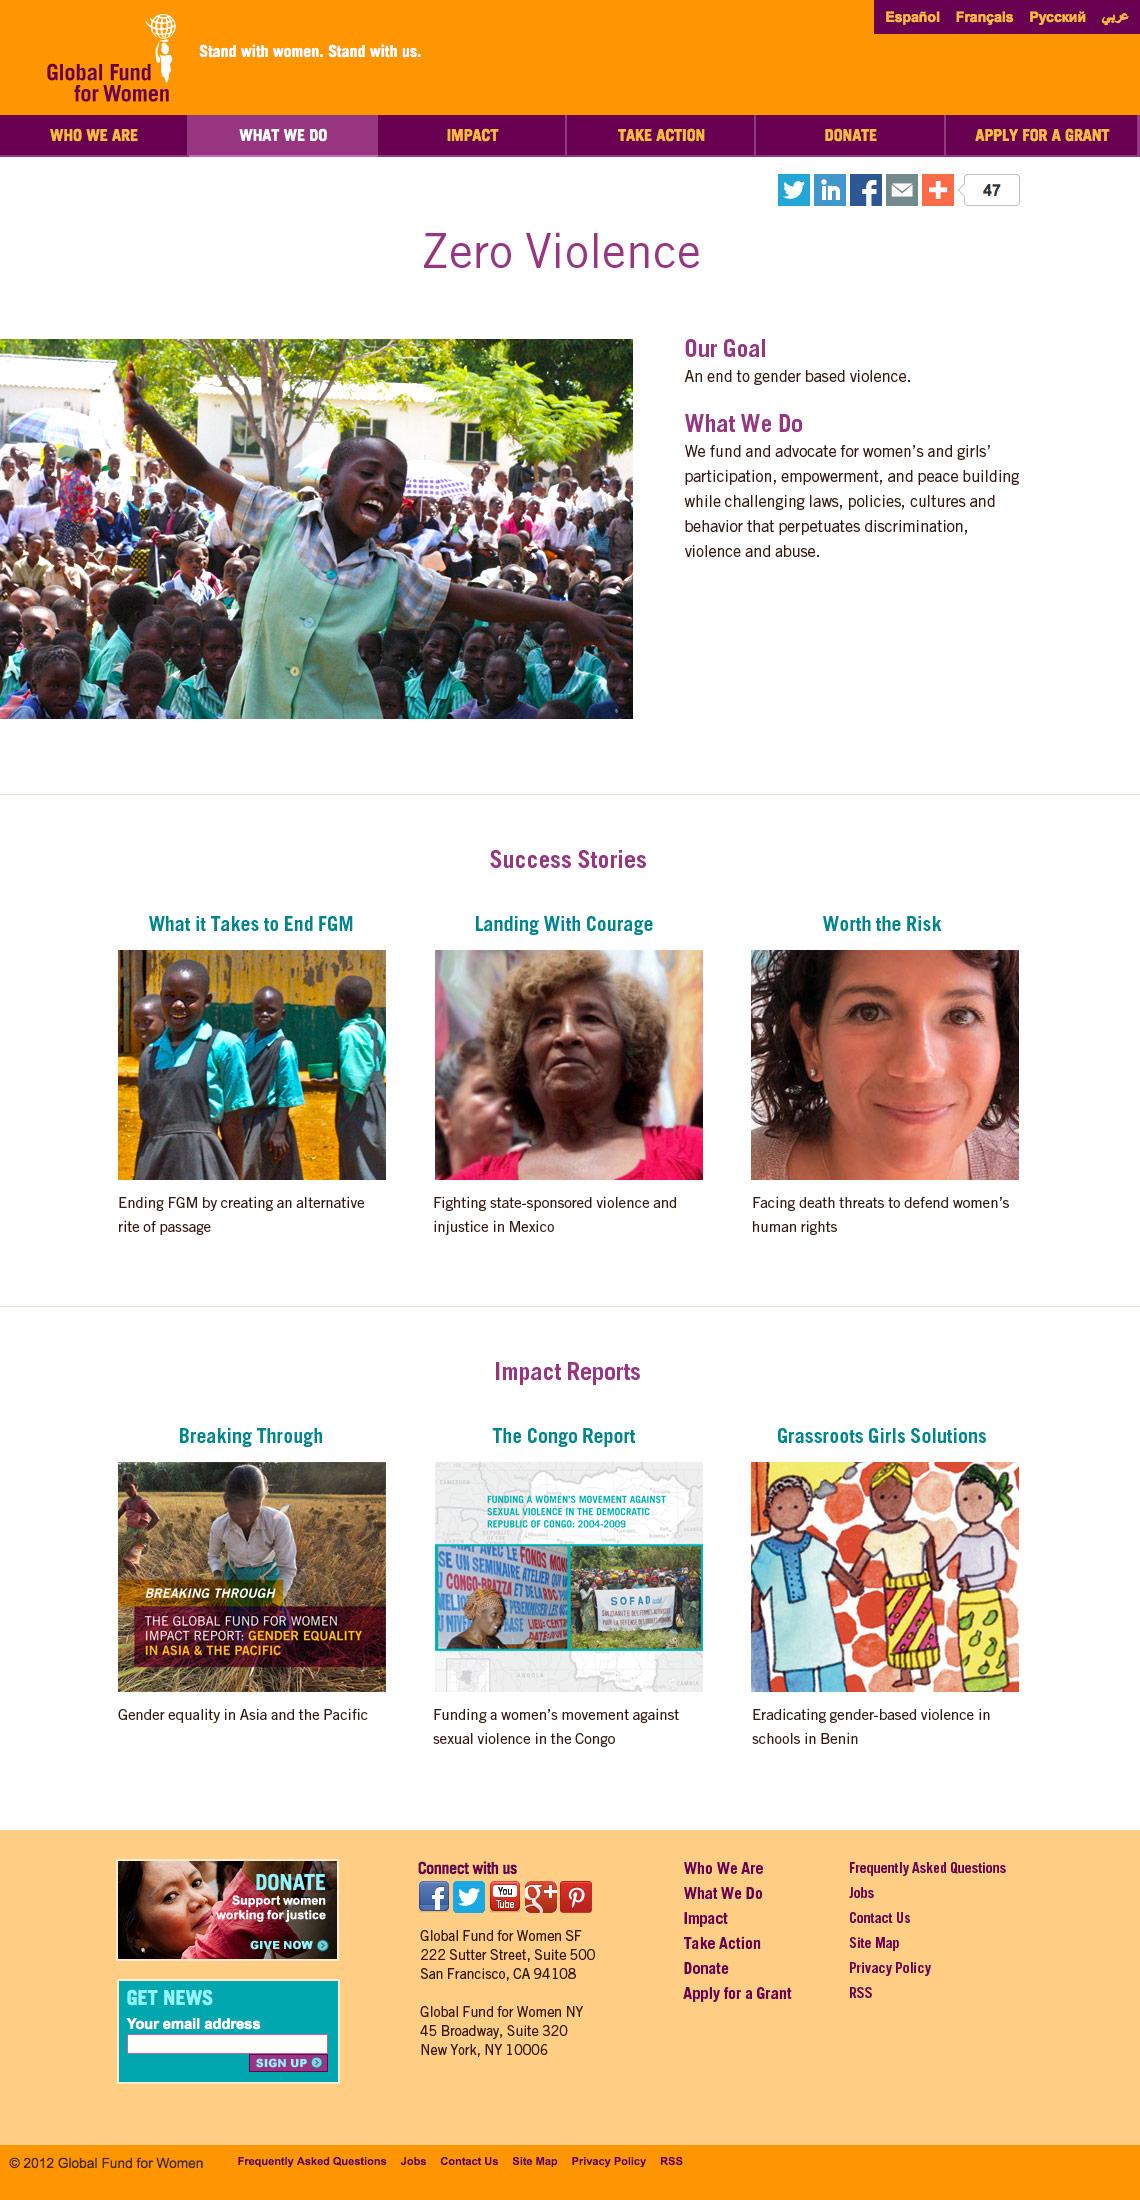 globalfundforwomen.org inside page